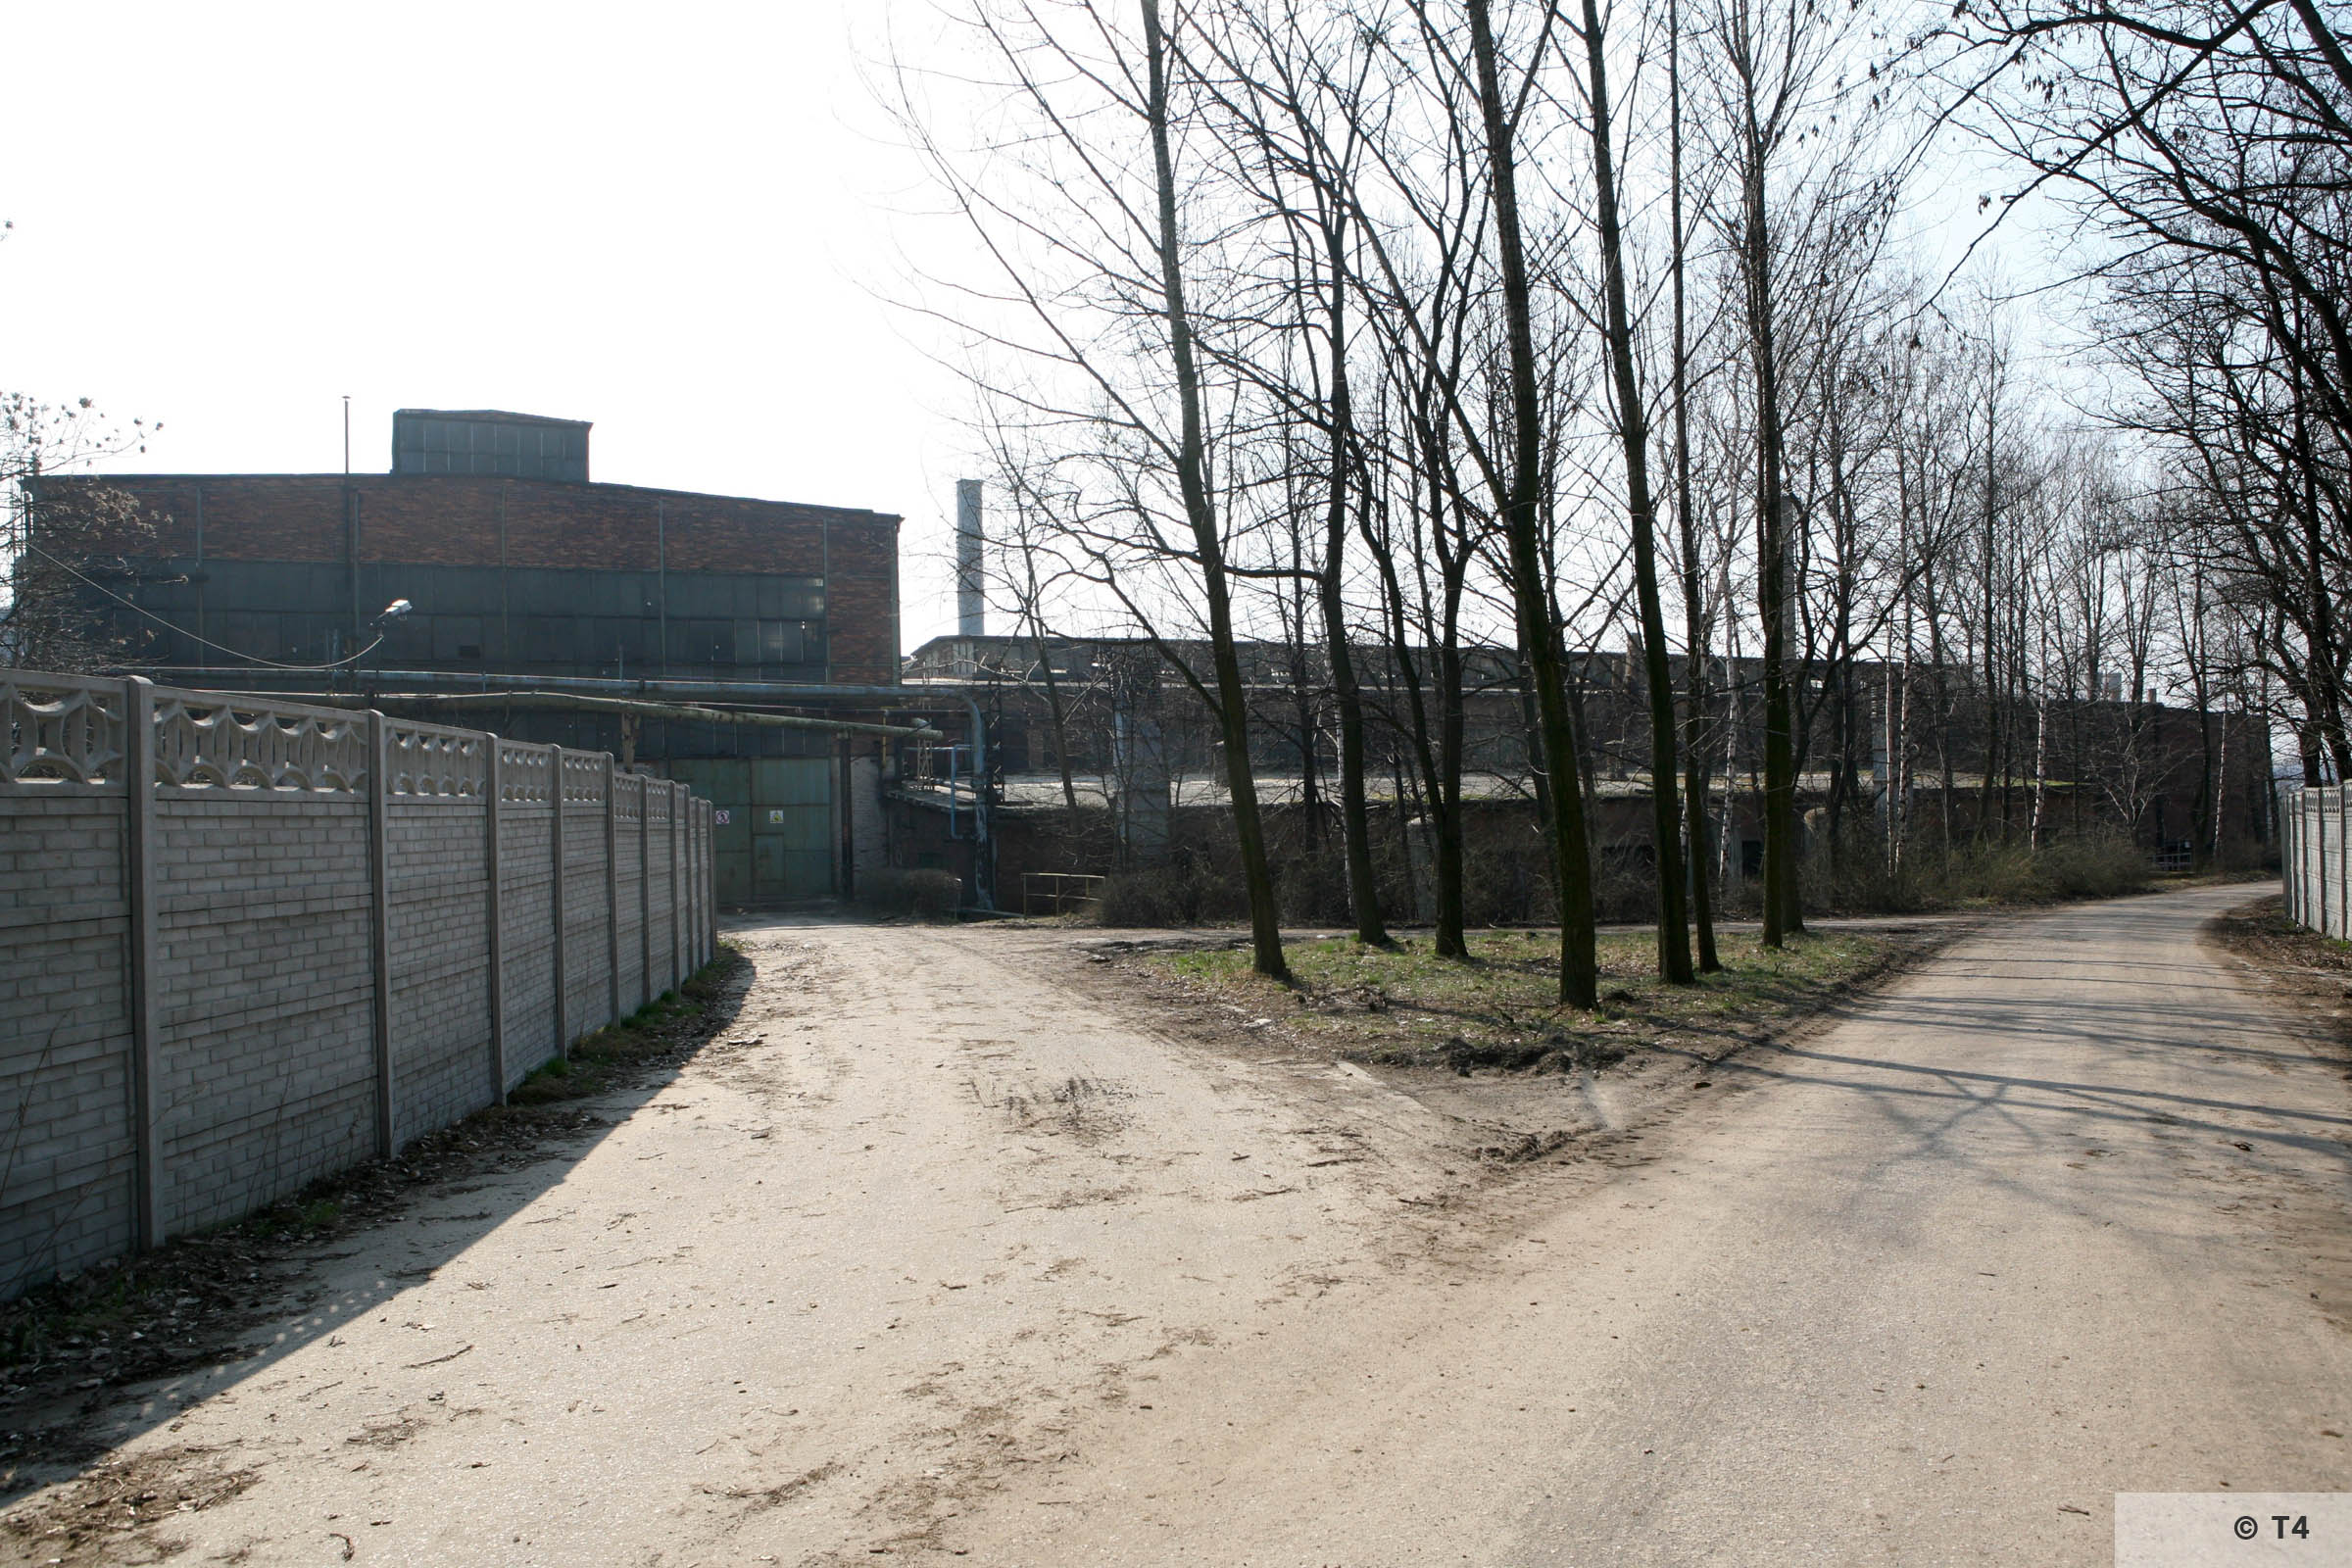 Entrance to steel works from prisoner camp. 2007 T4 6689